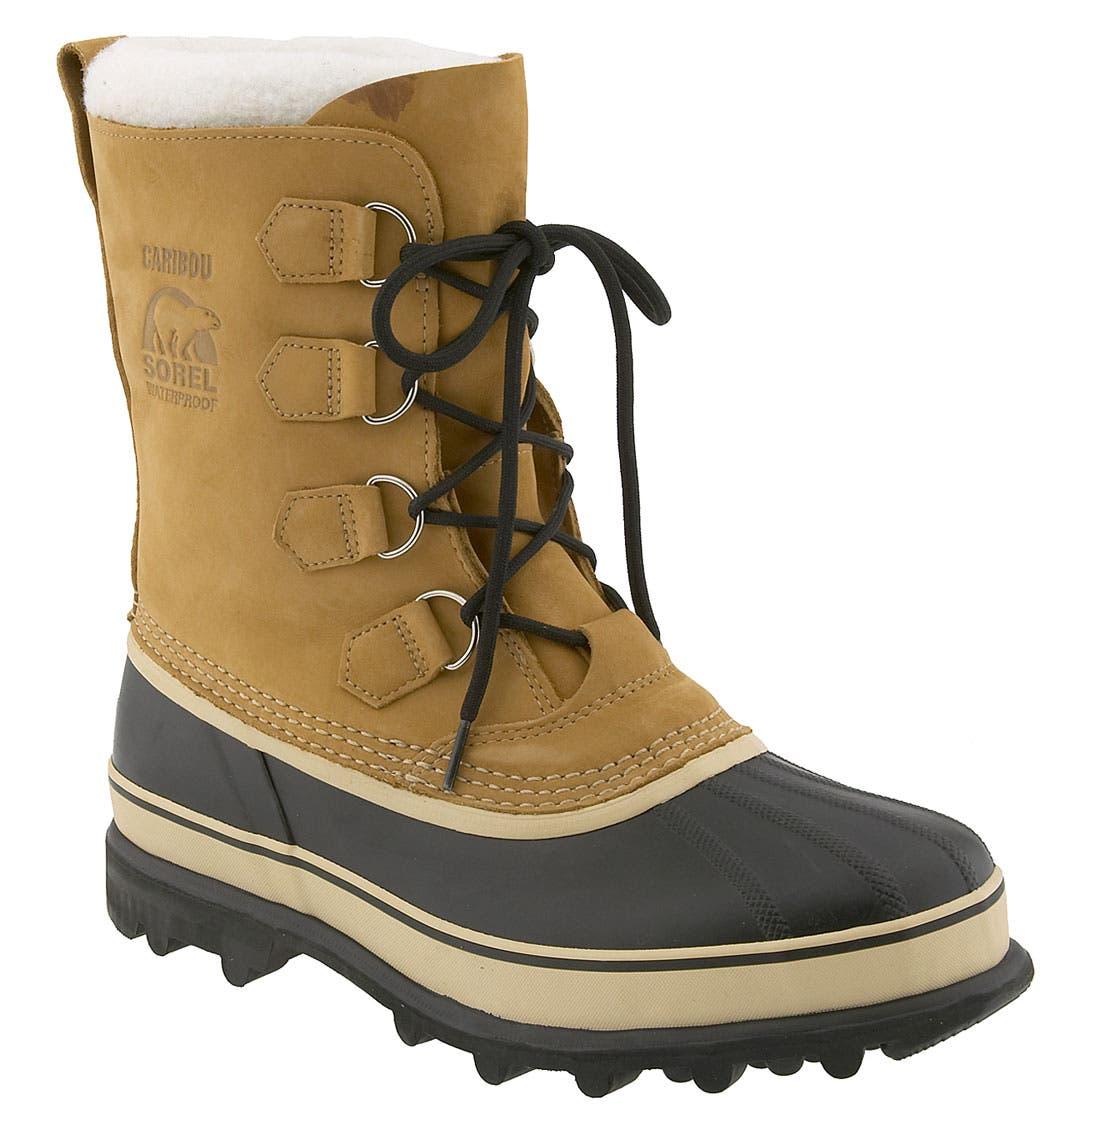 SOREL 'Caribou' Boot, Main, color, 281